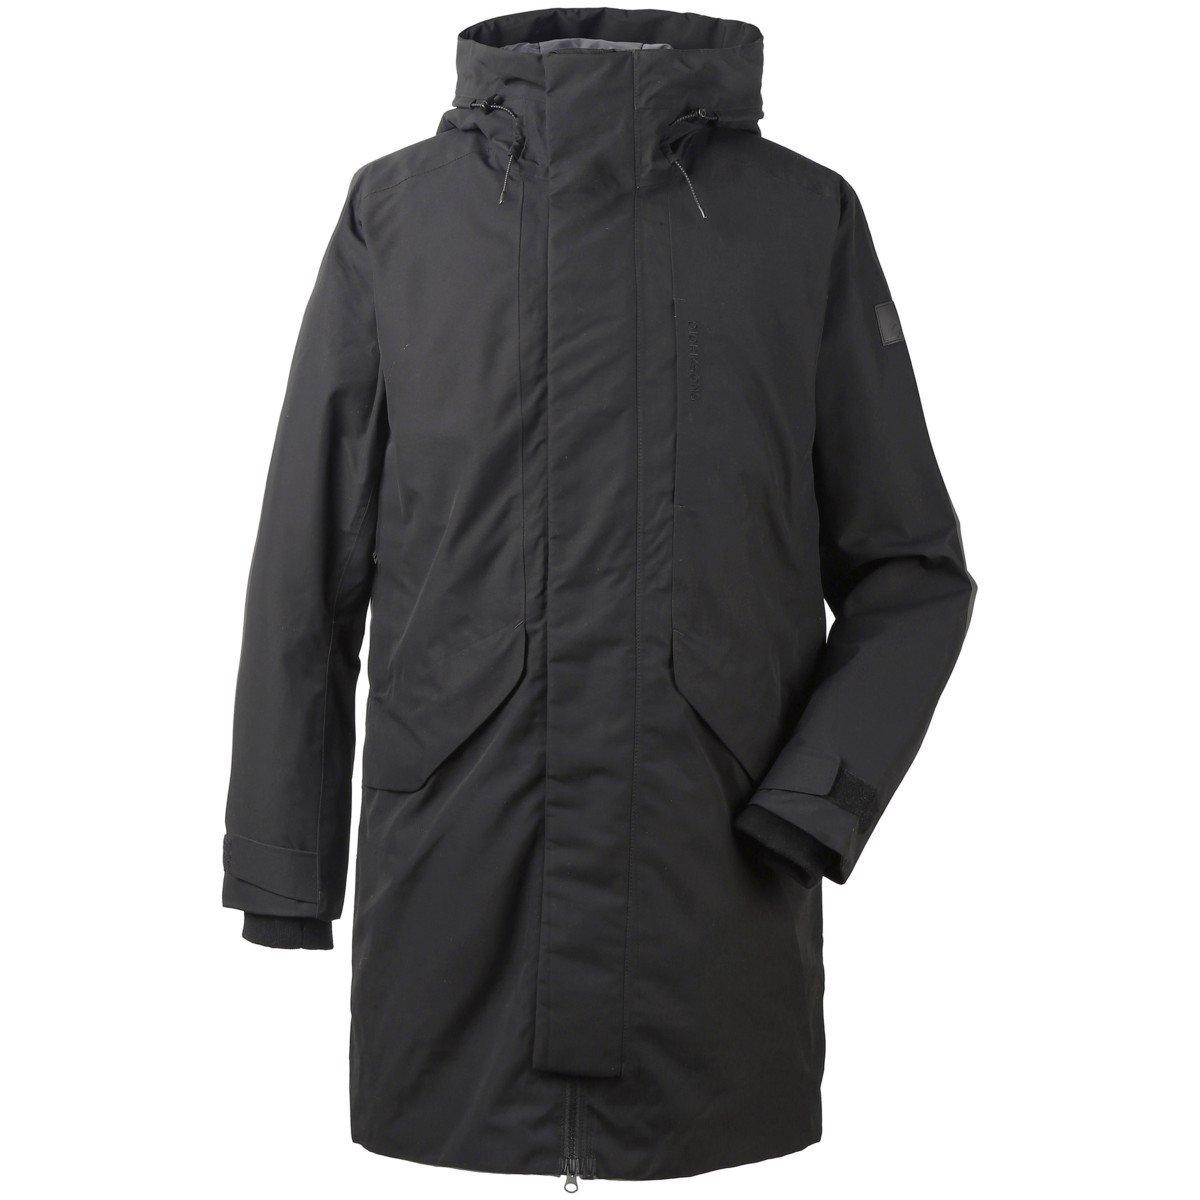 Didriksons Kabát KENNY pánský černá XL